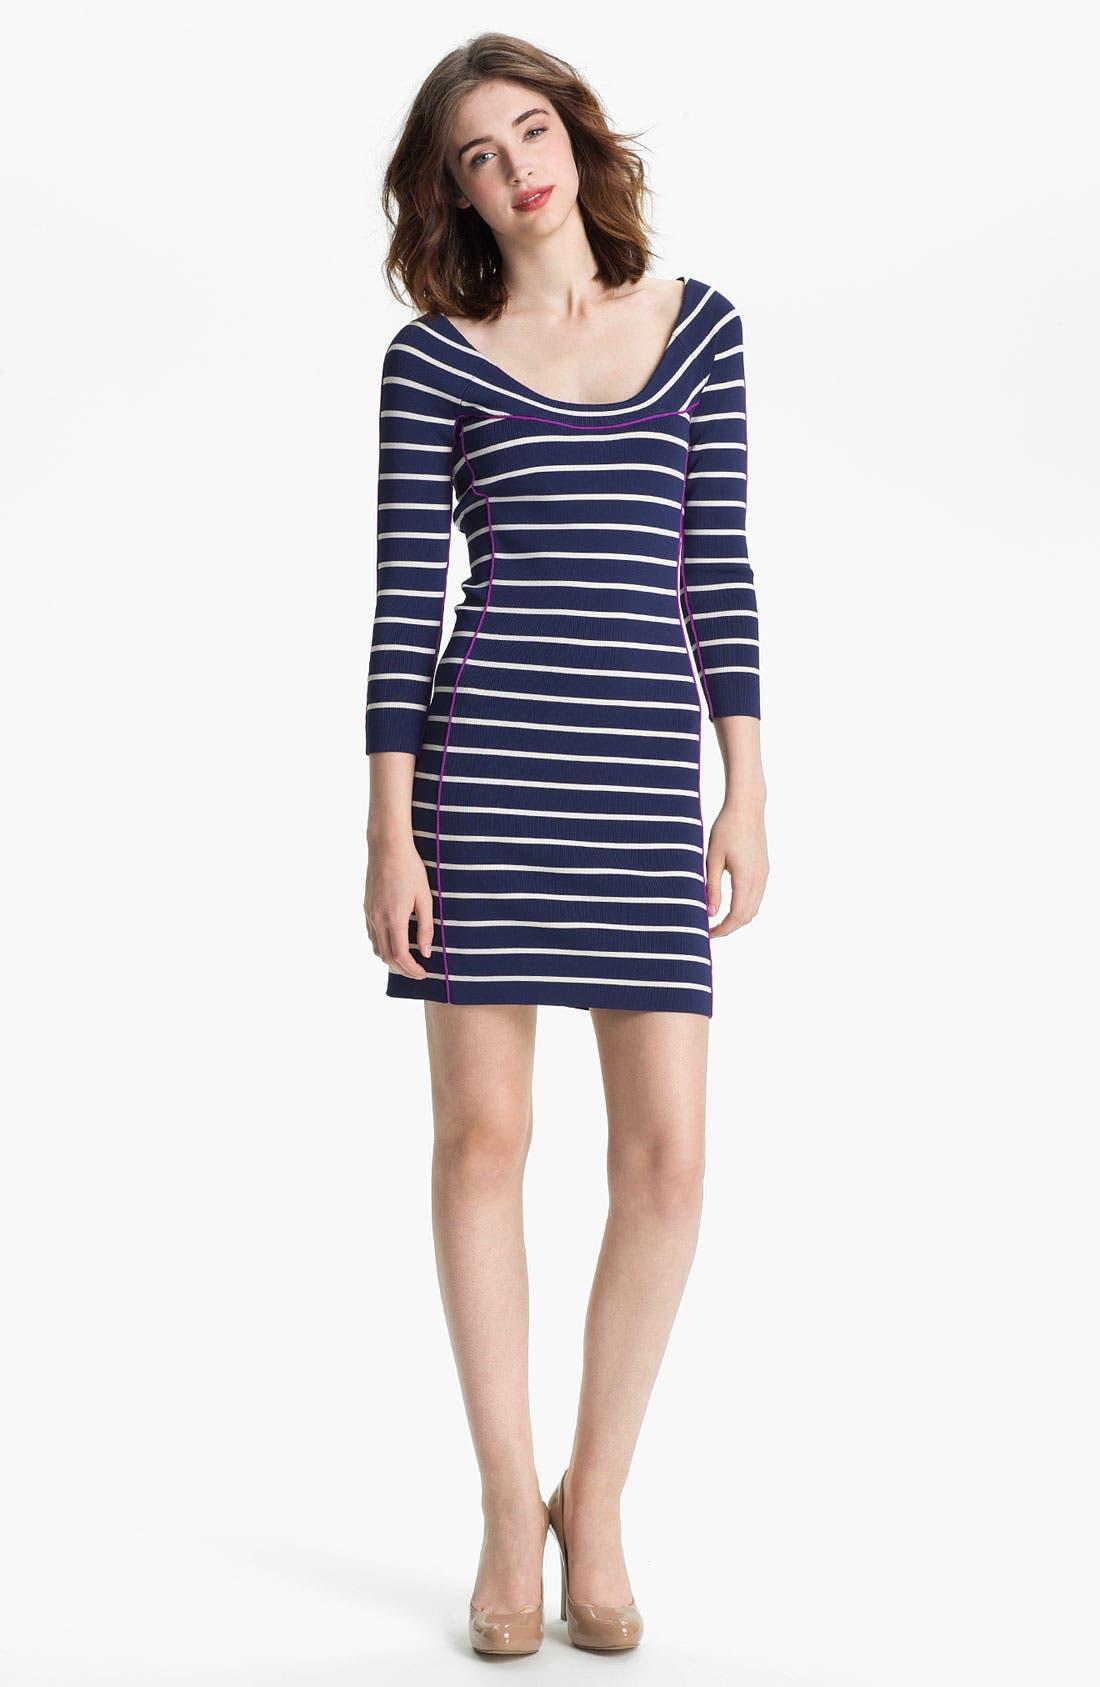 Alternate Image 1 Selected - Jessica Simpson Contrast Trim Stripe Knit Sheath Dress